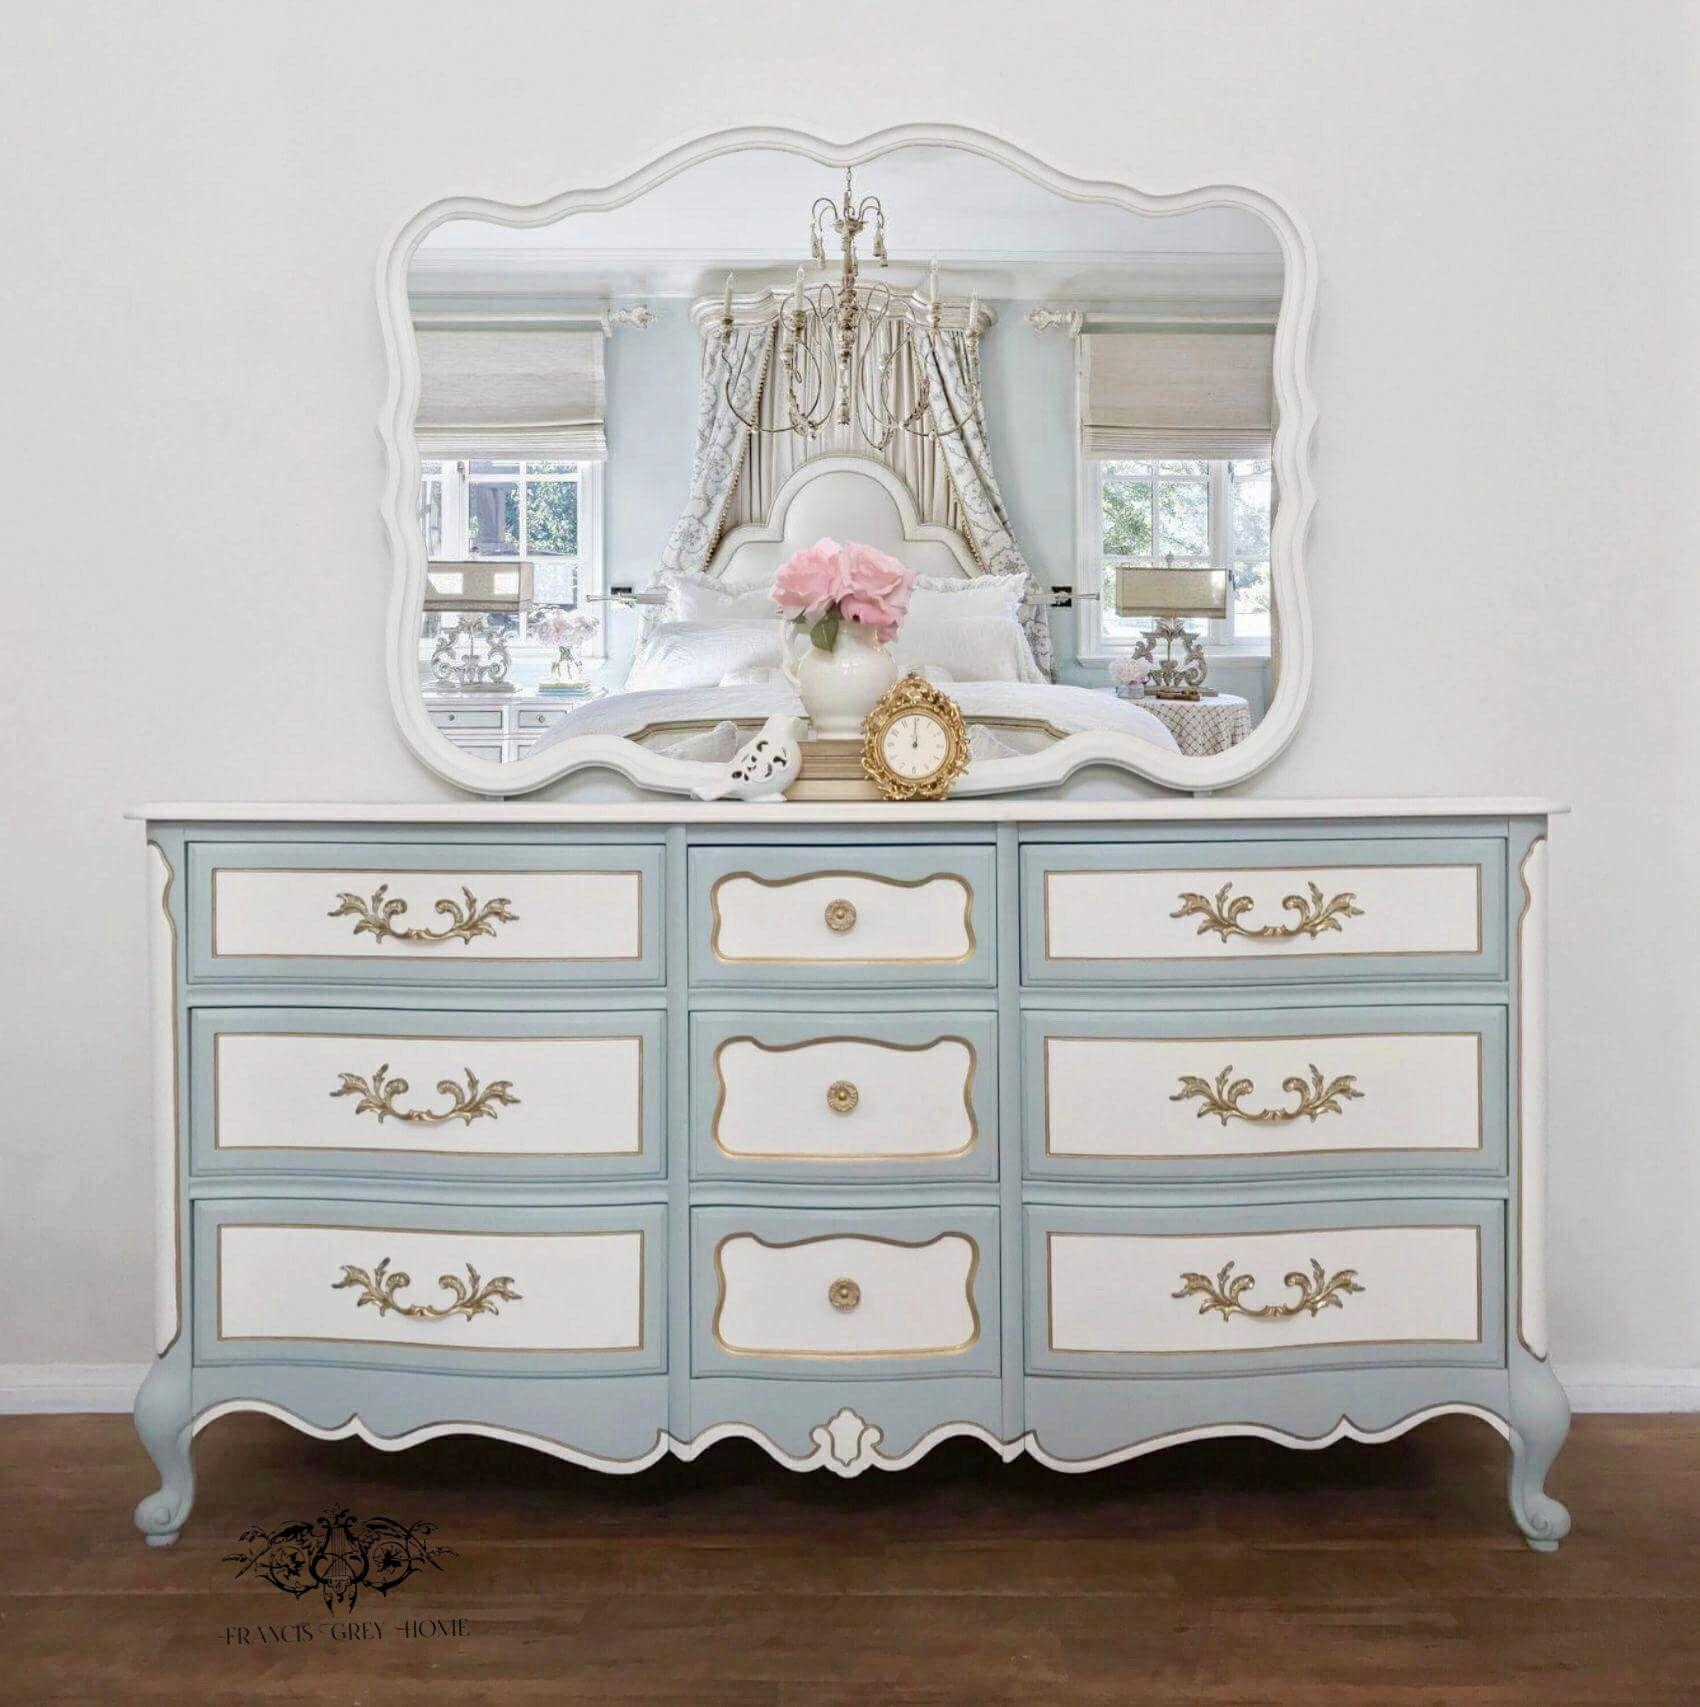 Nursery Dresser Bedroom French Provincial Painted Gray Morning Furniture Makeover Vintage Bett